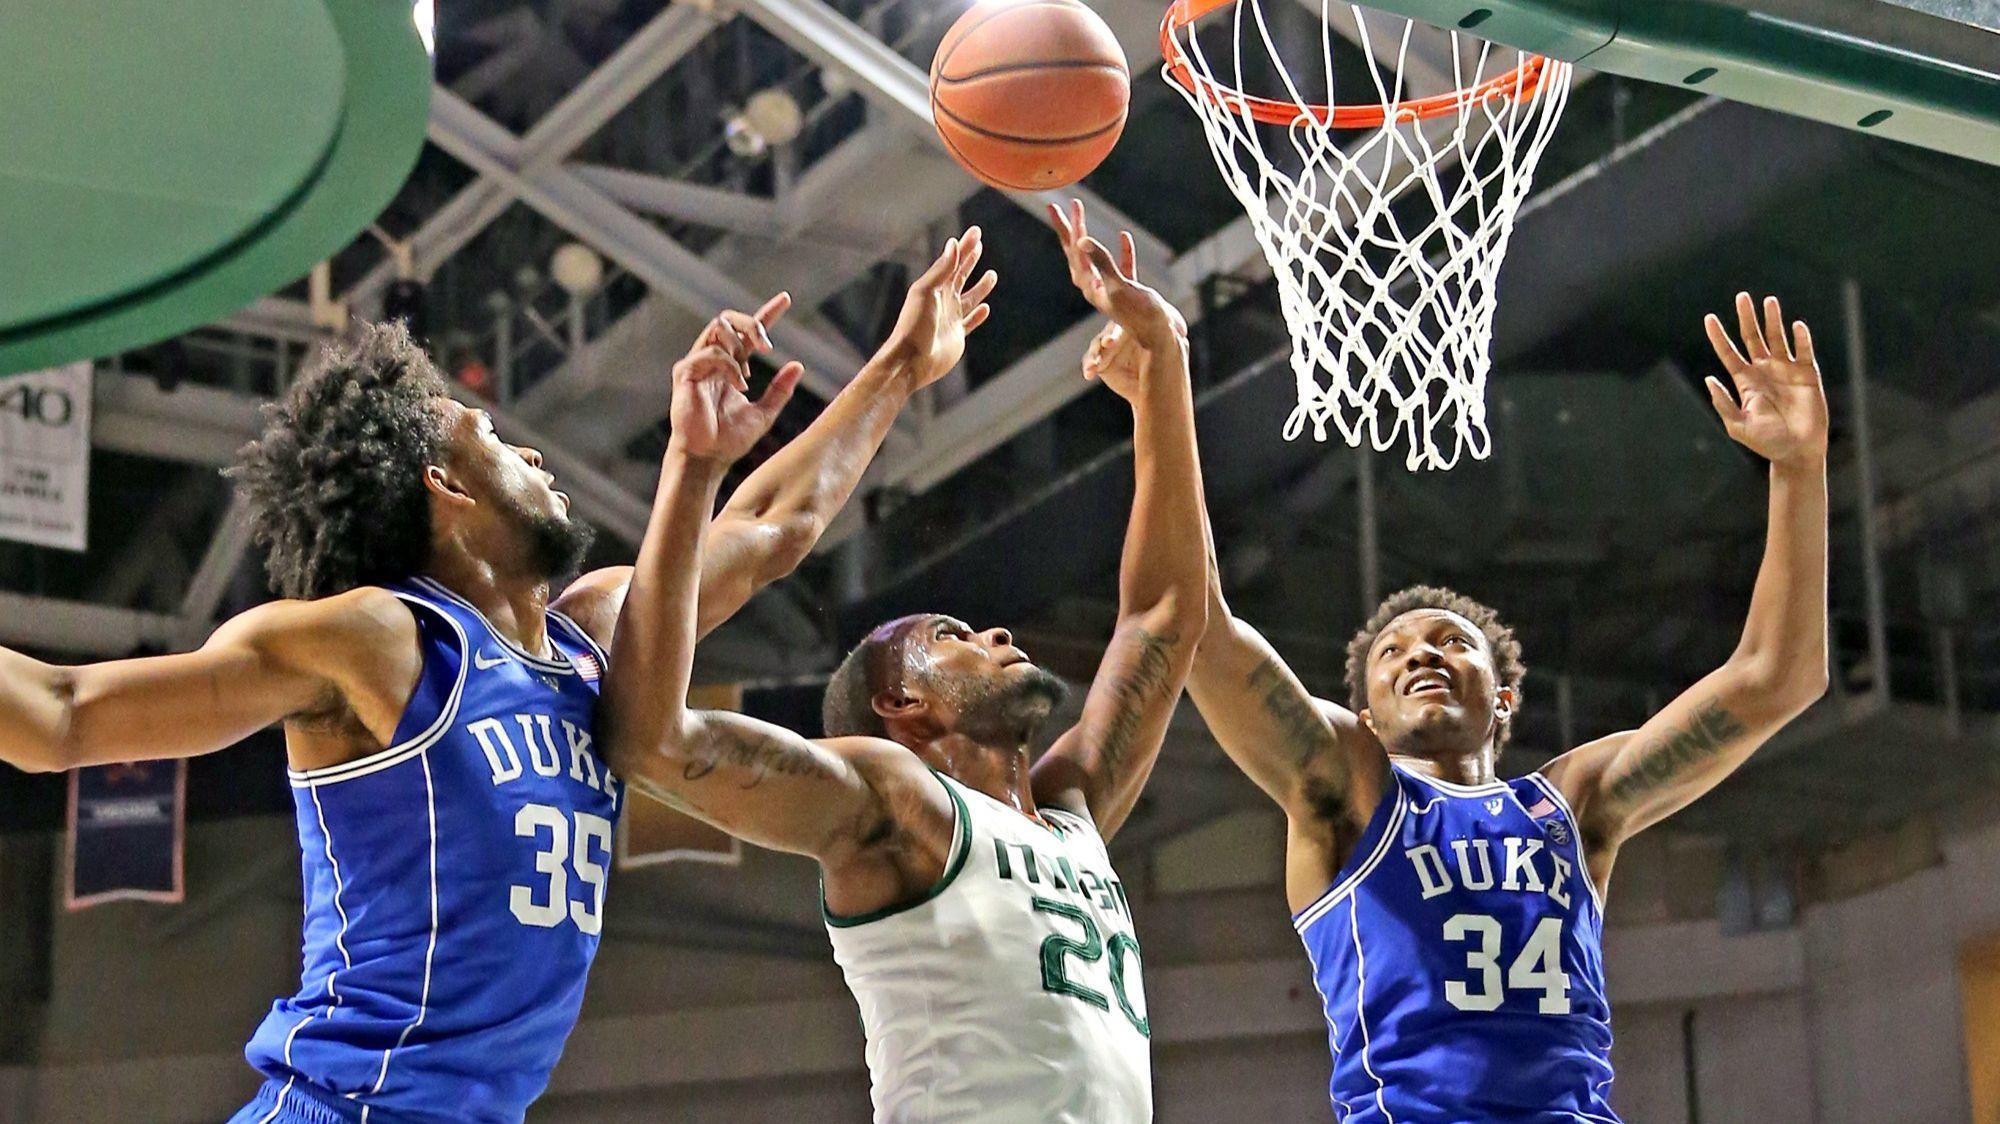 Fl-sp-miami-mens-basketball-duke-20180115